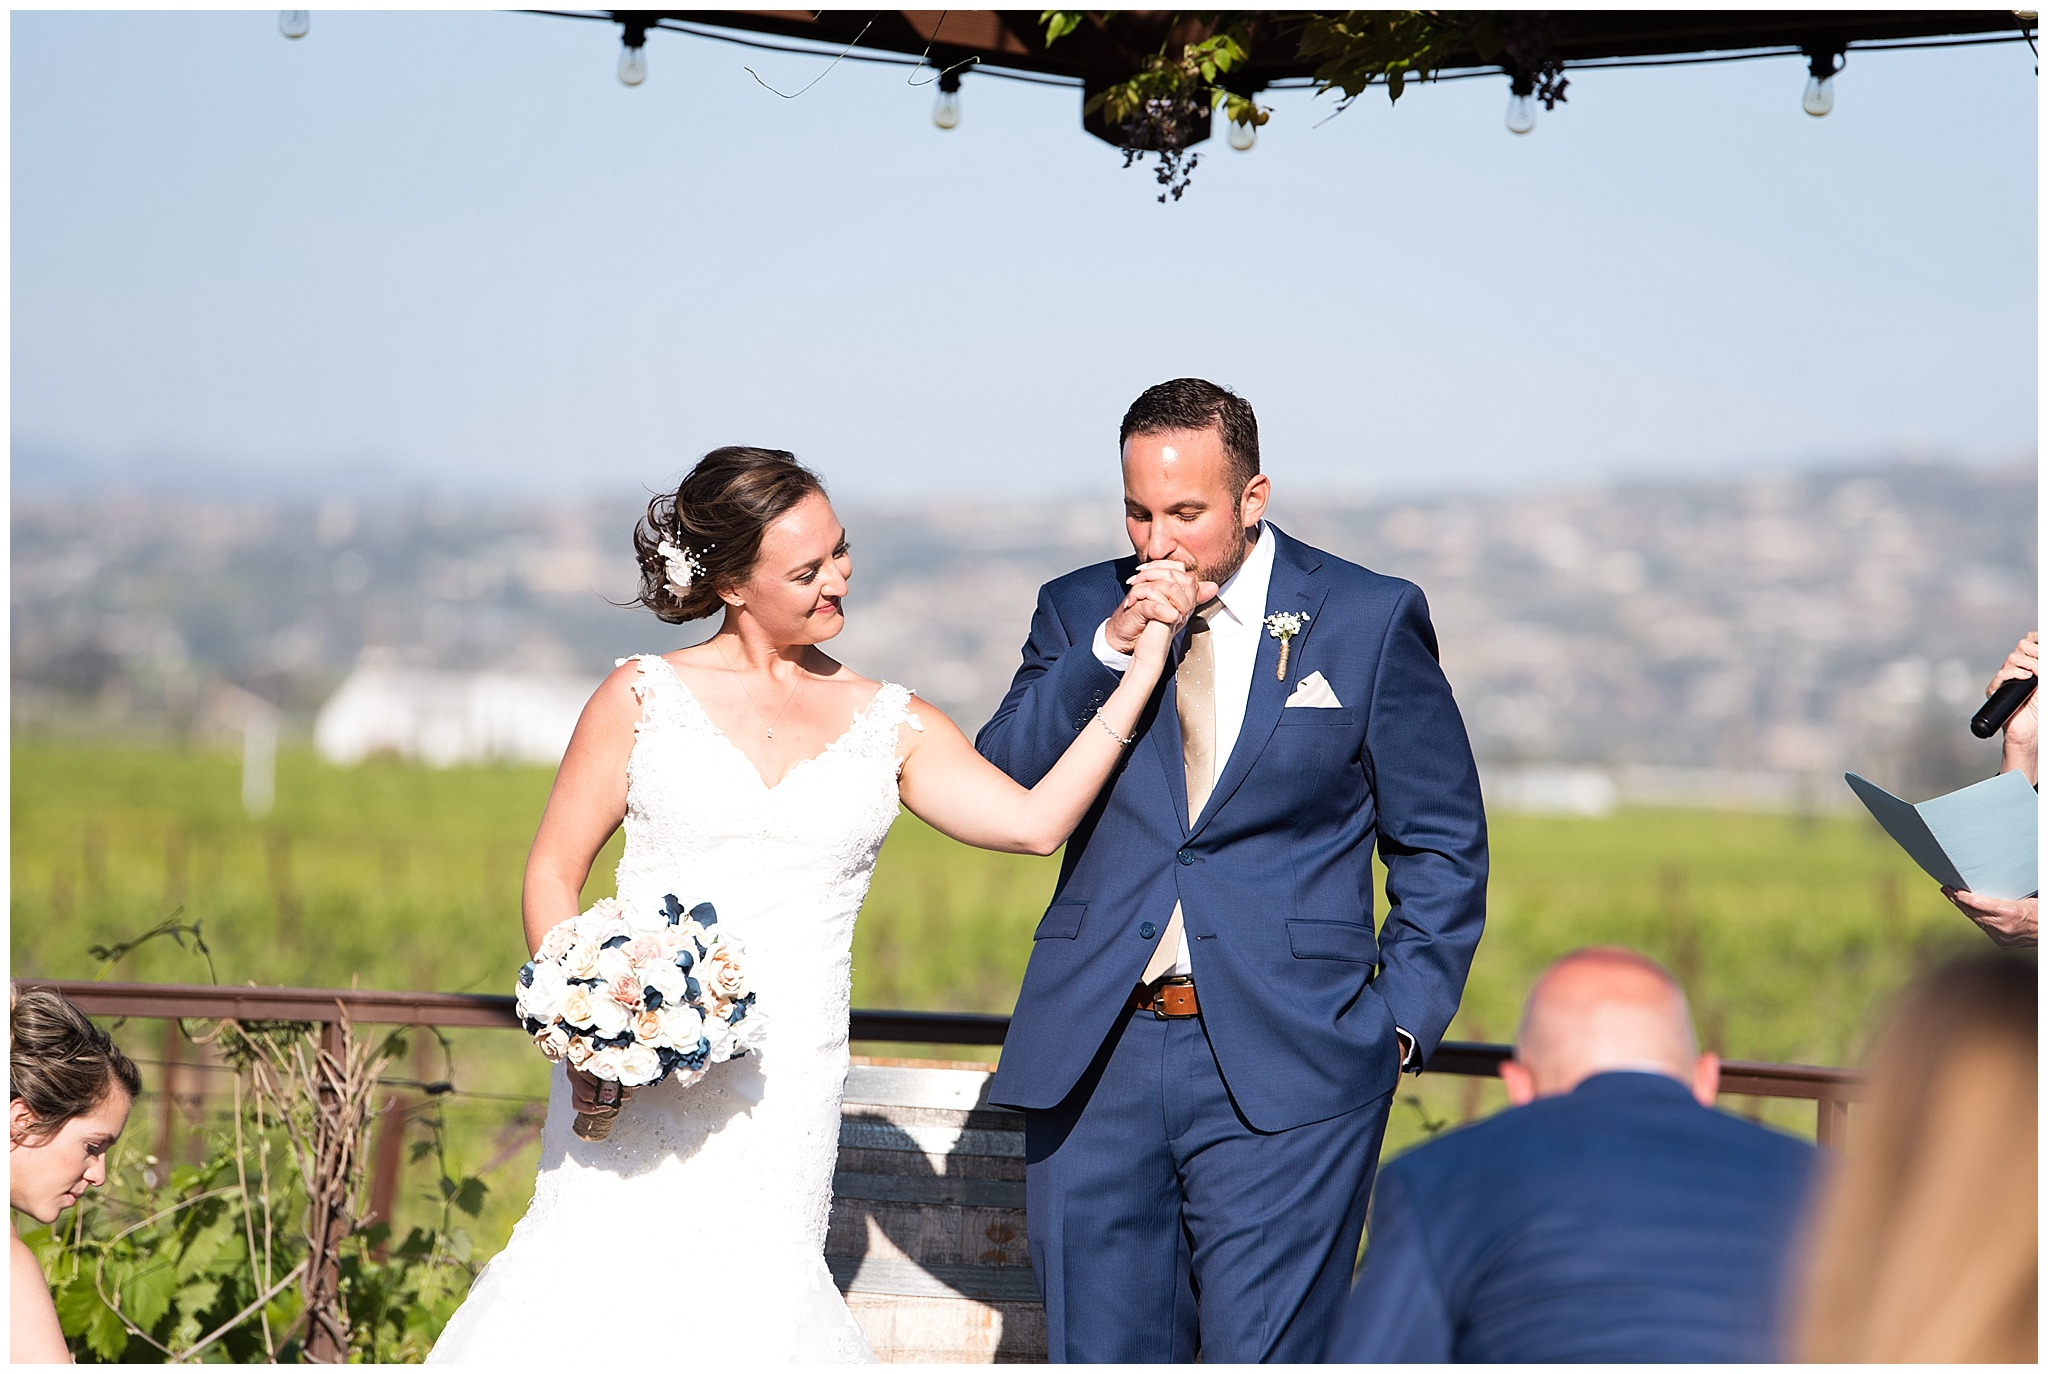 Vinny-Cayt-Wedding-4-26-18-2442.jpg